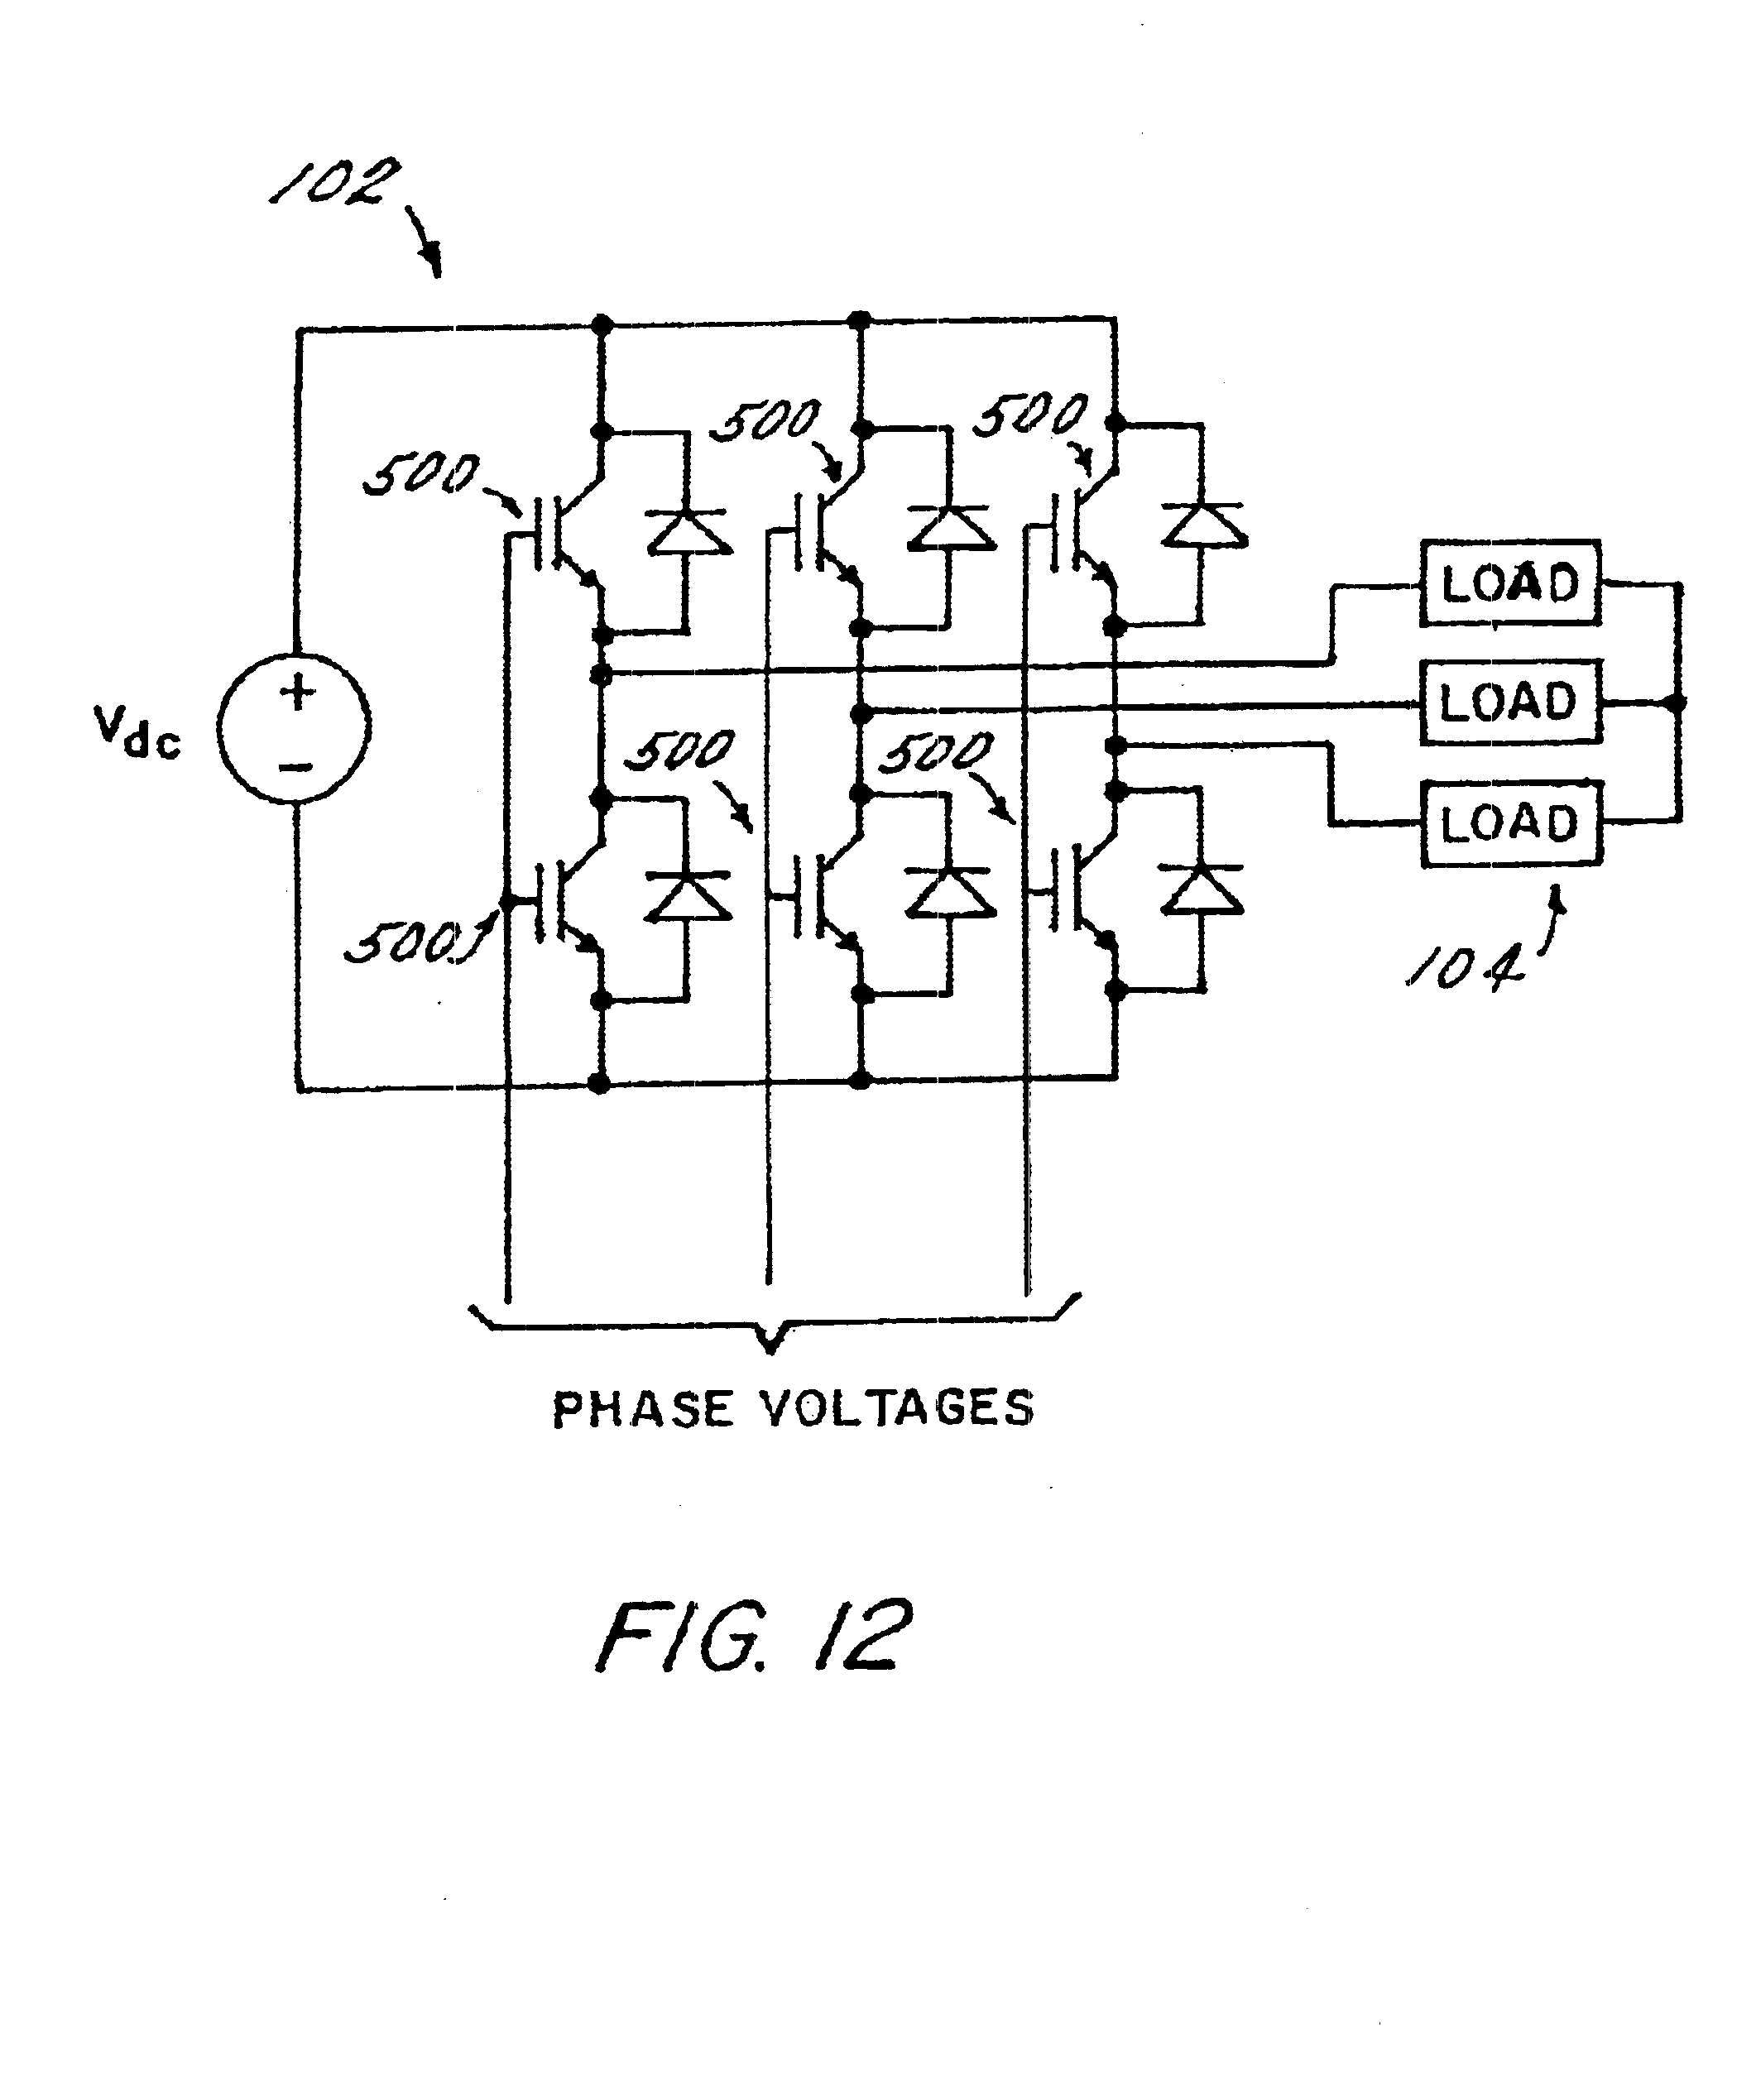 Generous 1995 Chevy Blazer Wiring Diagram Contemporary Wiring